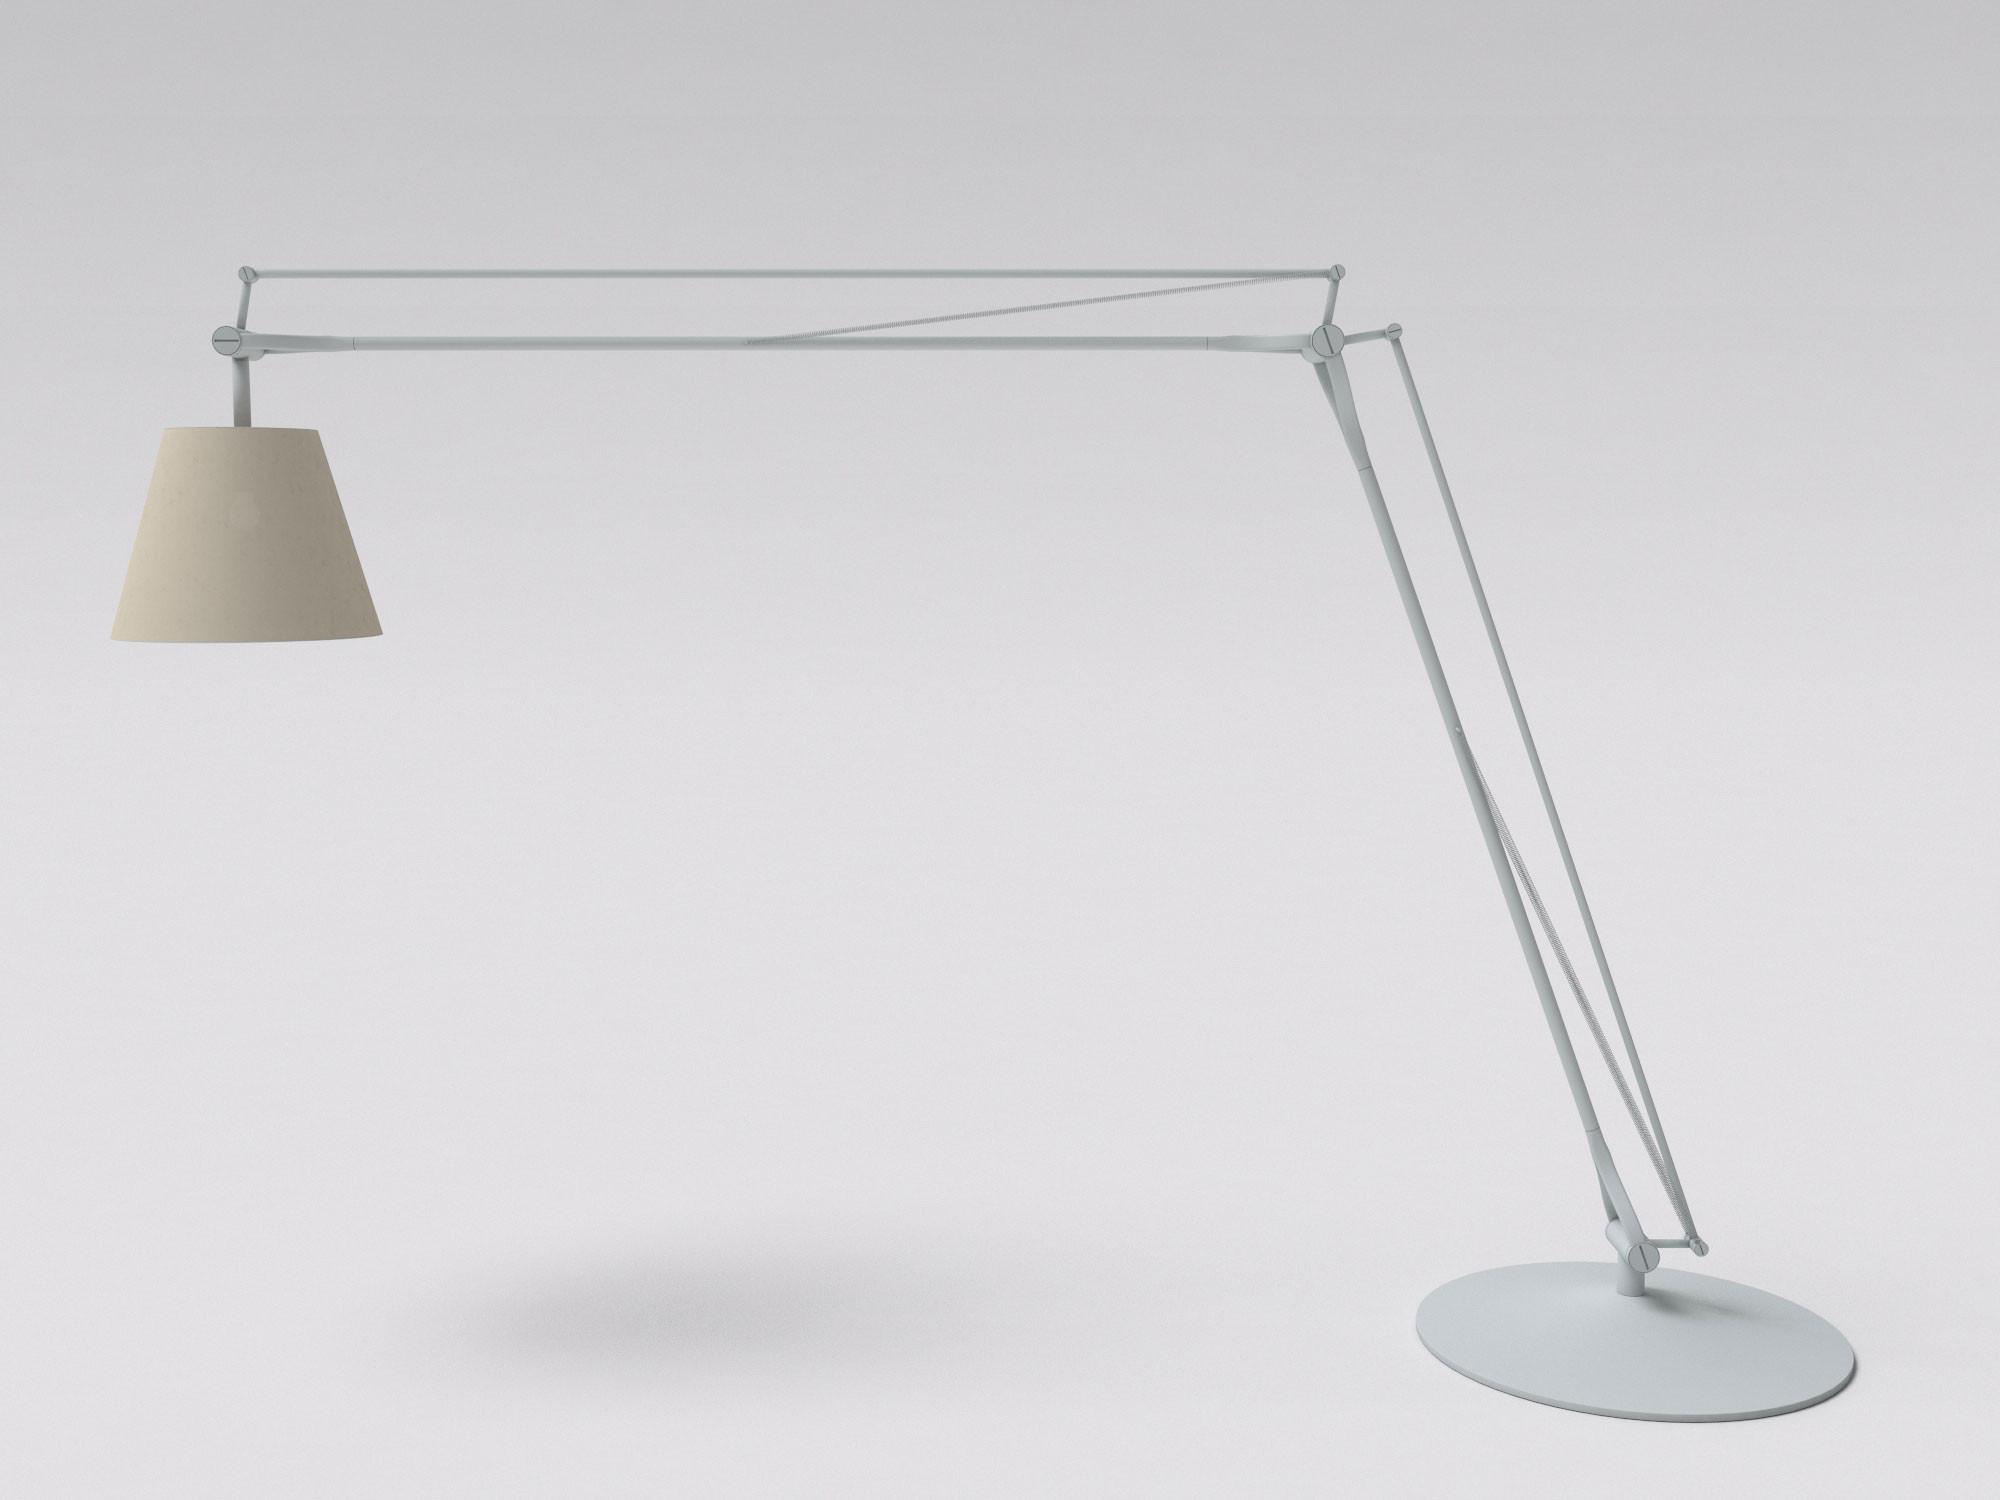 flos-super-archimon-floor-lamp0000.jpg